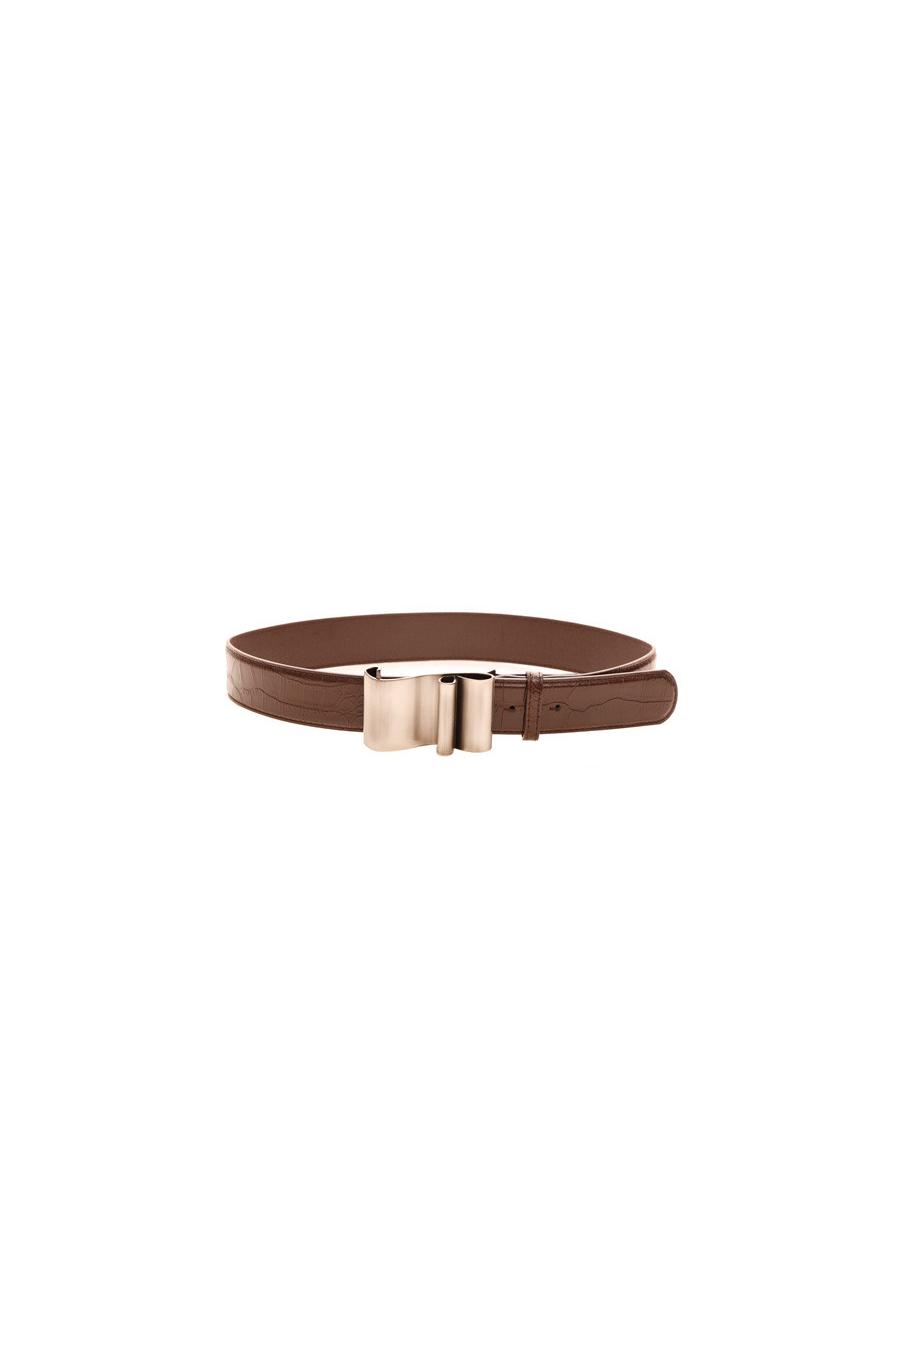 Brown crocodile skin effect belt with worked rectangular buckle - 543114